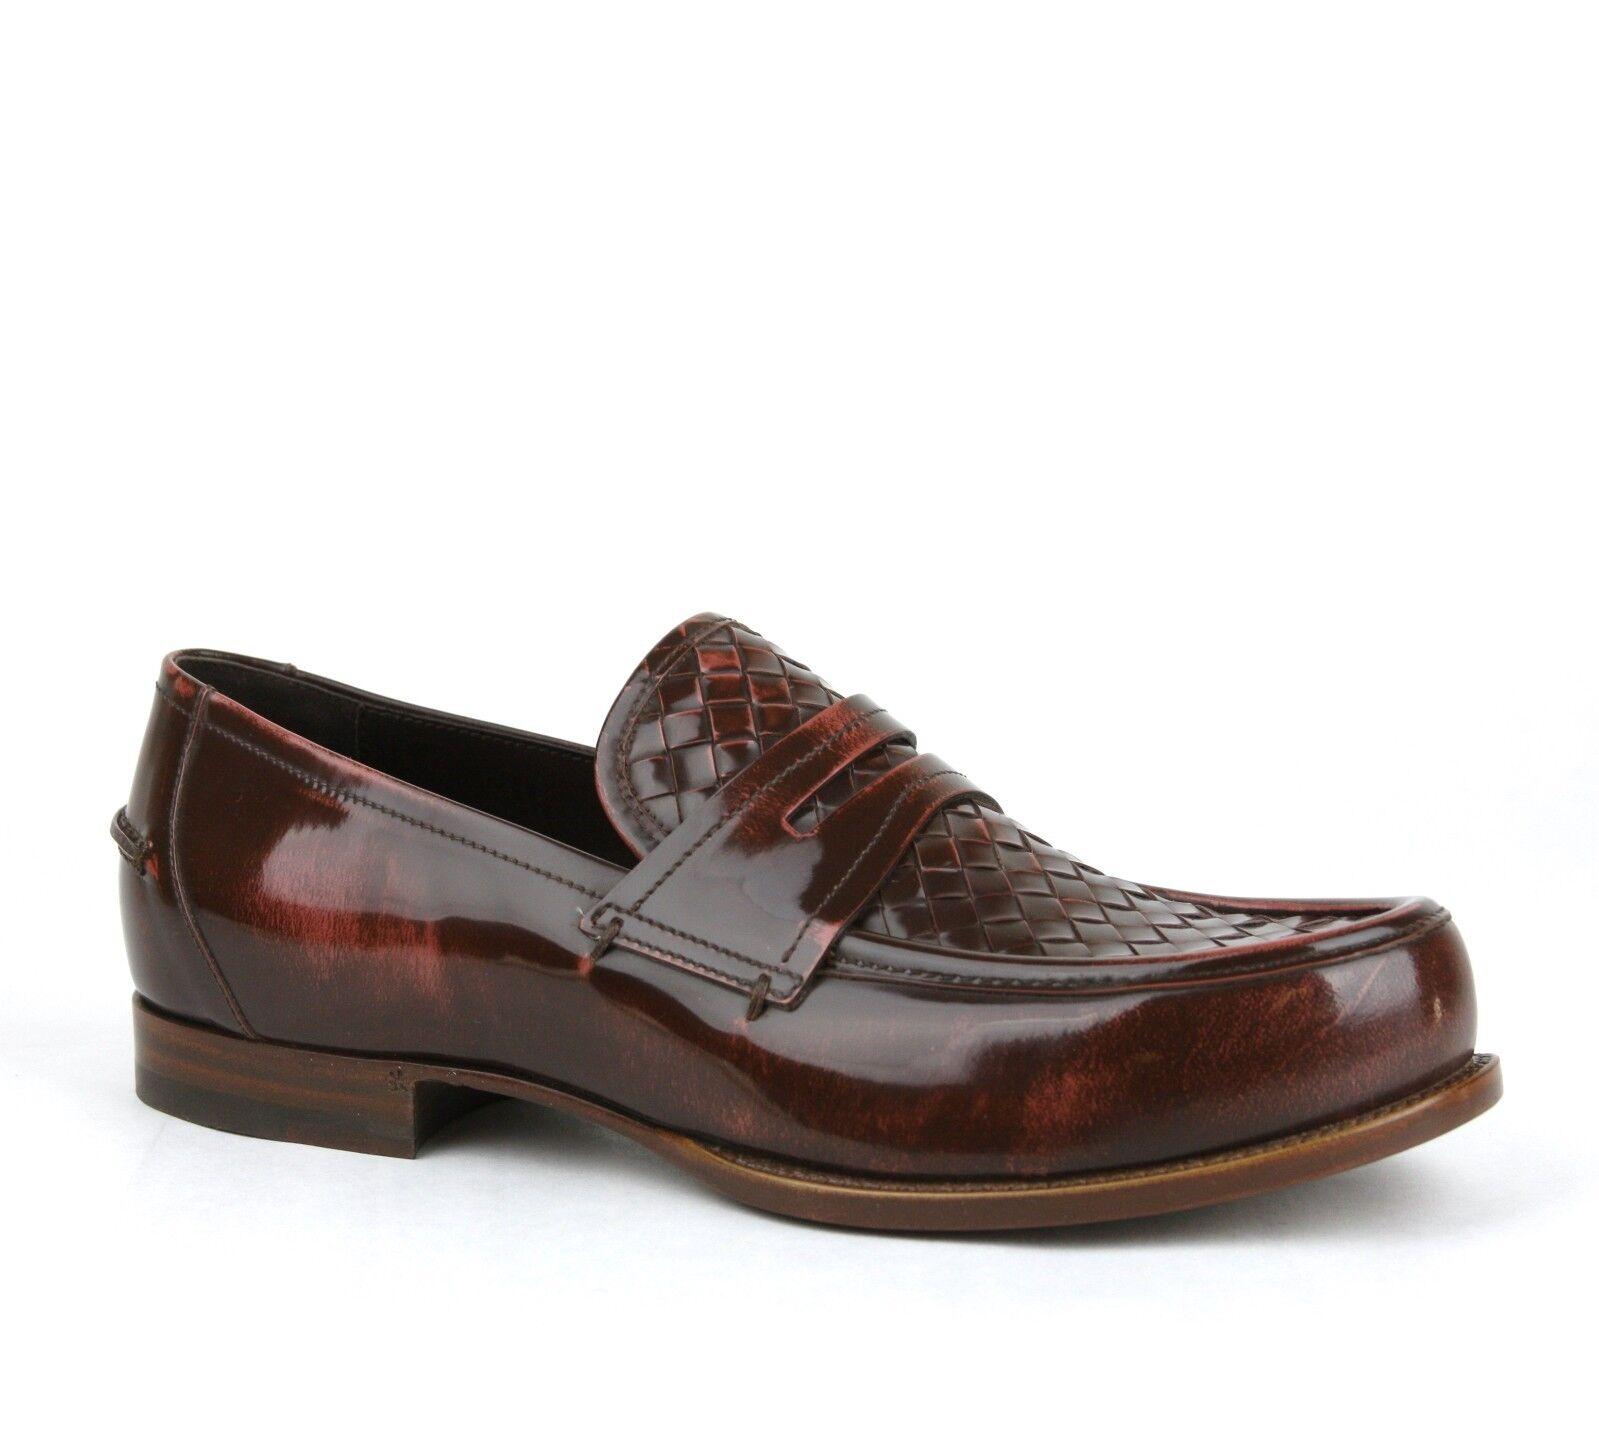 790 New Bottega Veneta Mens Leather Woven Loafer Dress shoes 298734 6323